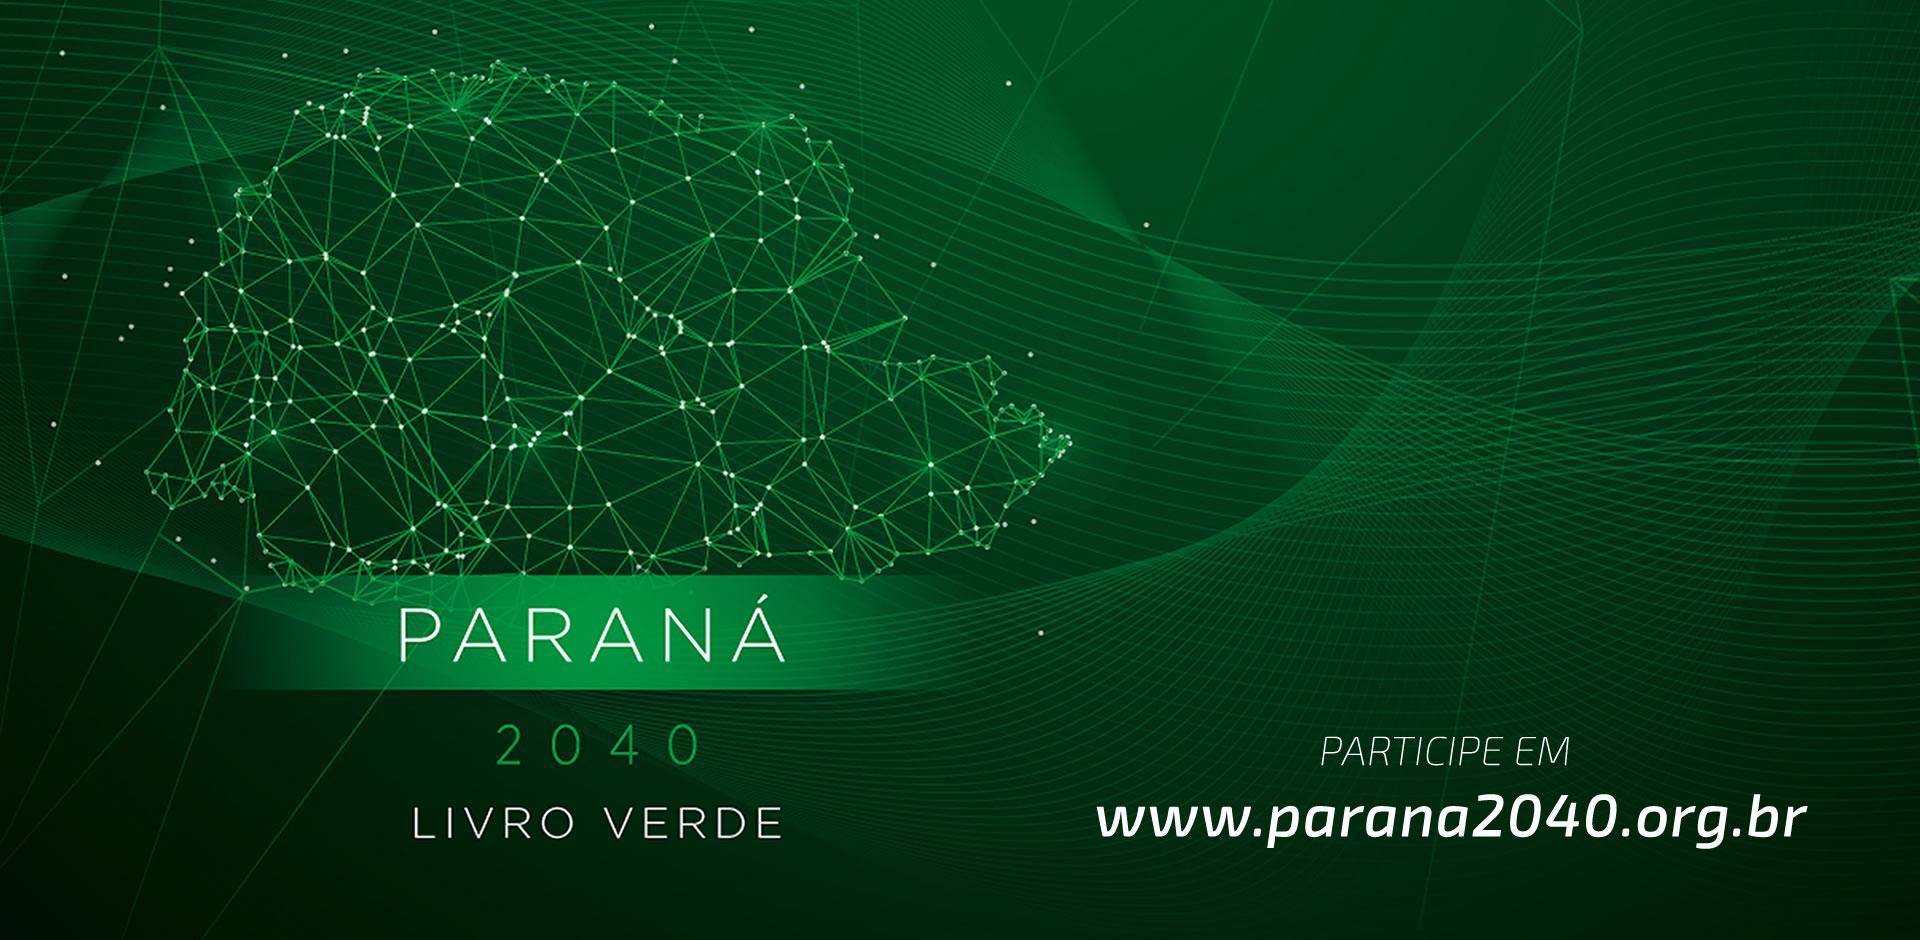 Paraná 2040